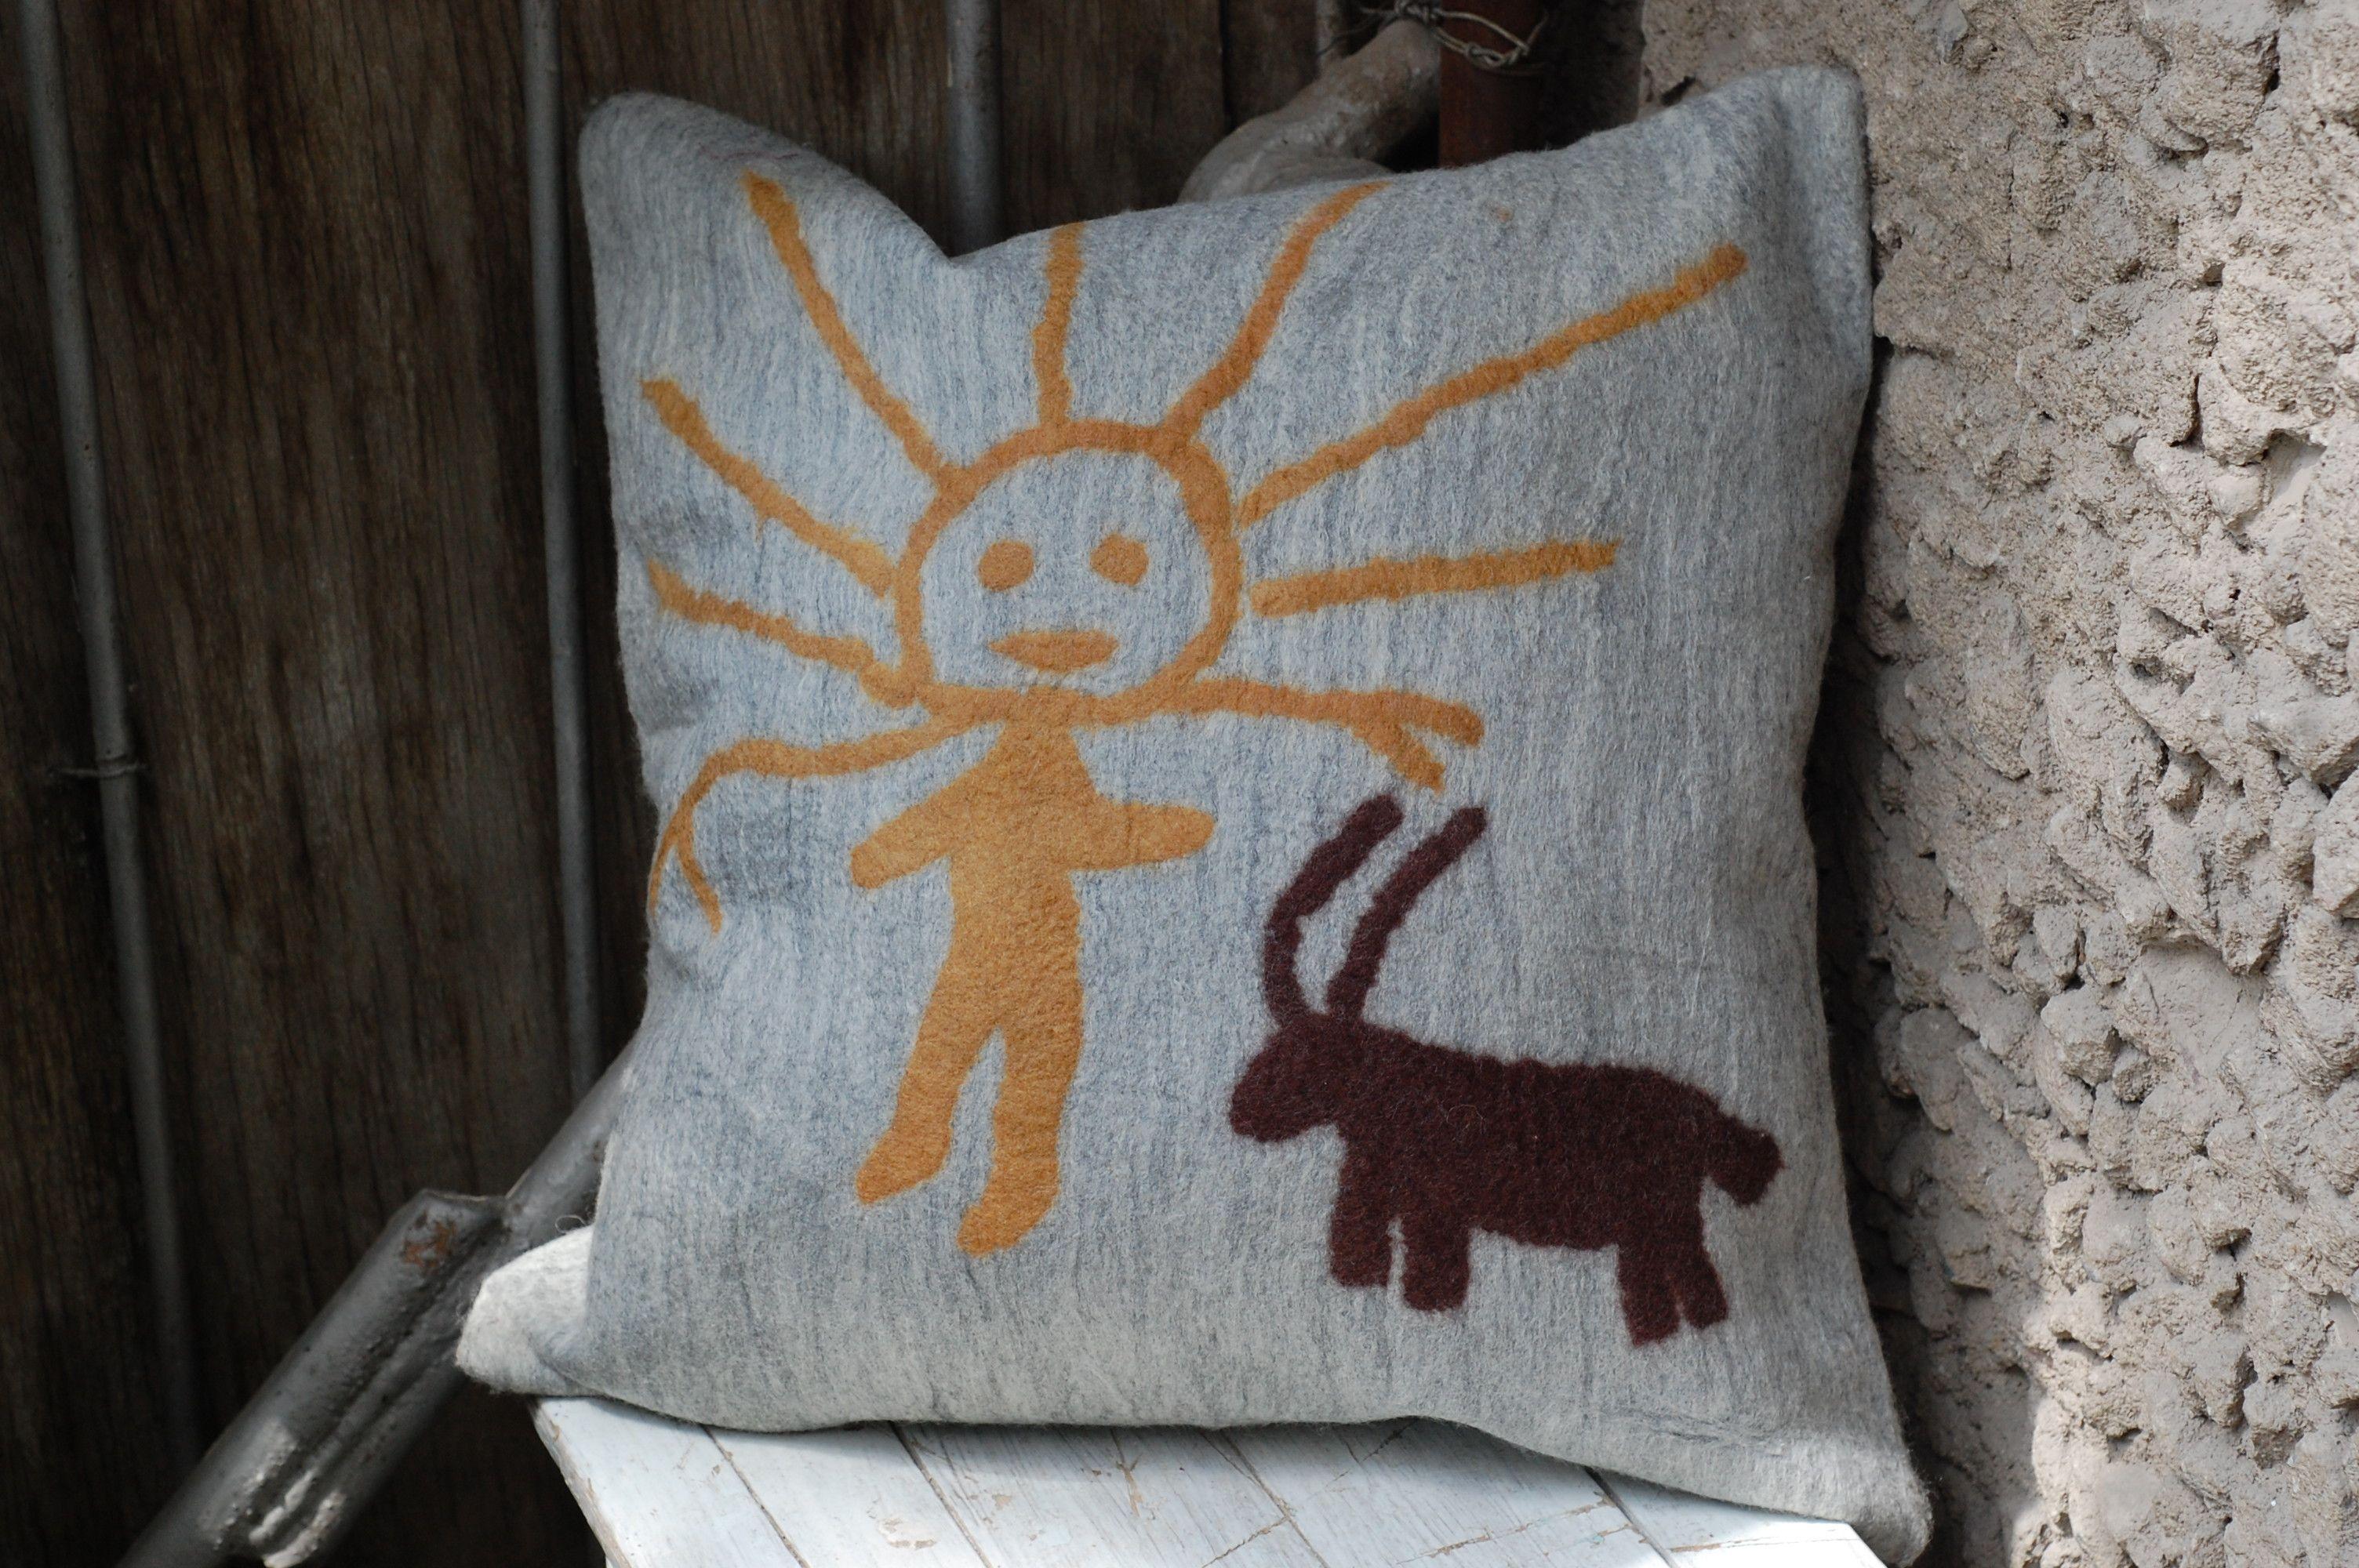 """Sun Boy"" - our cushion cover based on petroglyphs in Kyrgyzstan, made by Purity.    Handmade from felt, using the traditional Kyrgyz method ""Ala Kiyiz"" www.madeandtold.com"